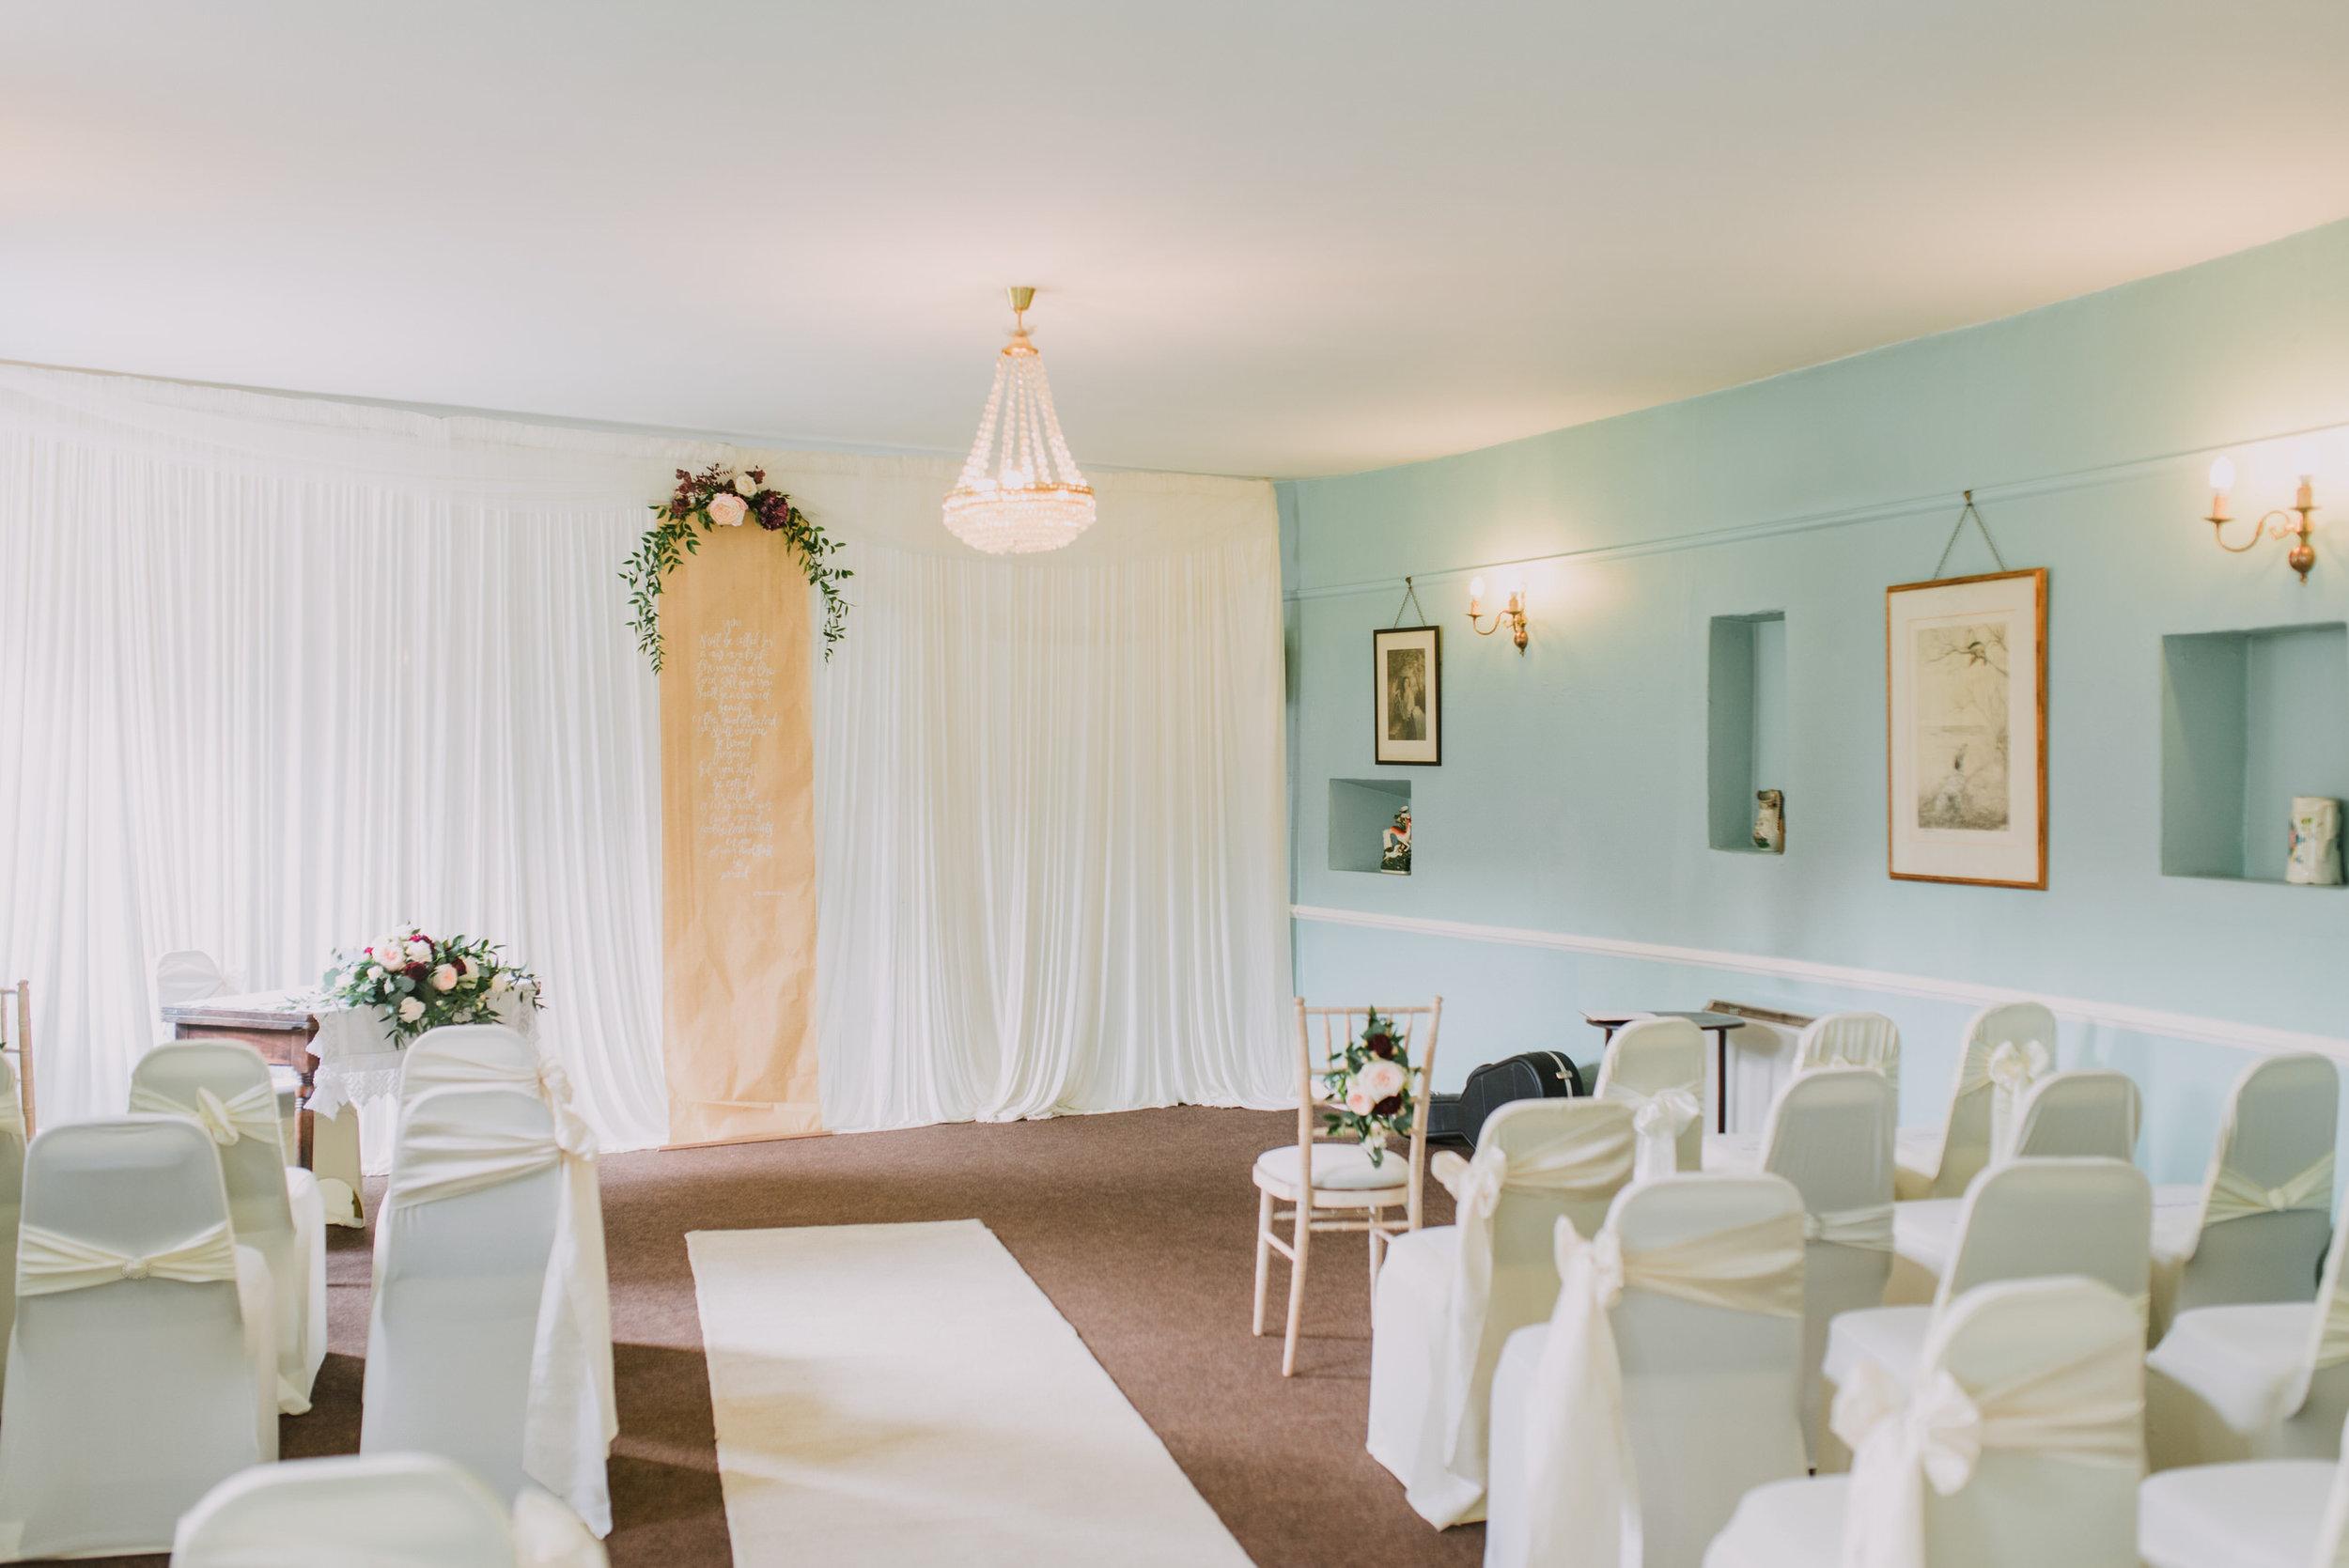 lissanoure castle wedding, northern ireland wedding photographer, romantic northern irish wedding venue, castle wedding ireland, natural wedding photography ni (24).jpg